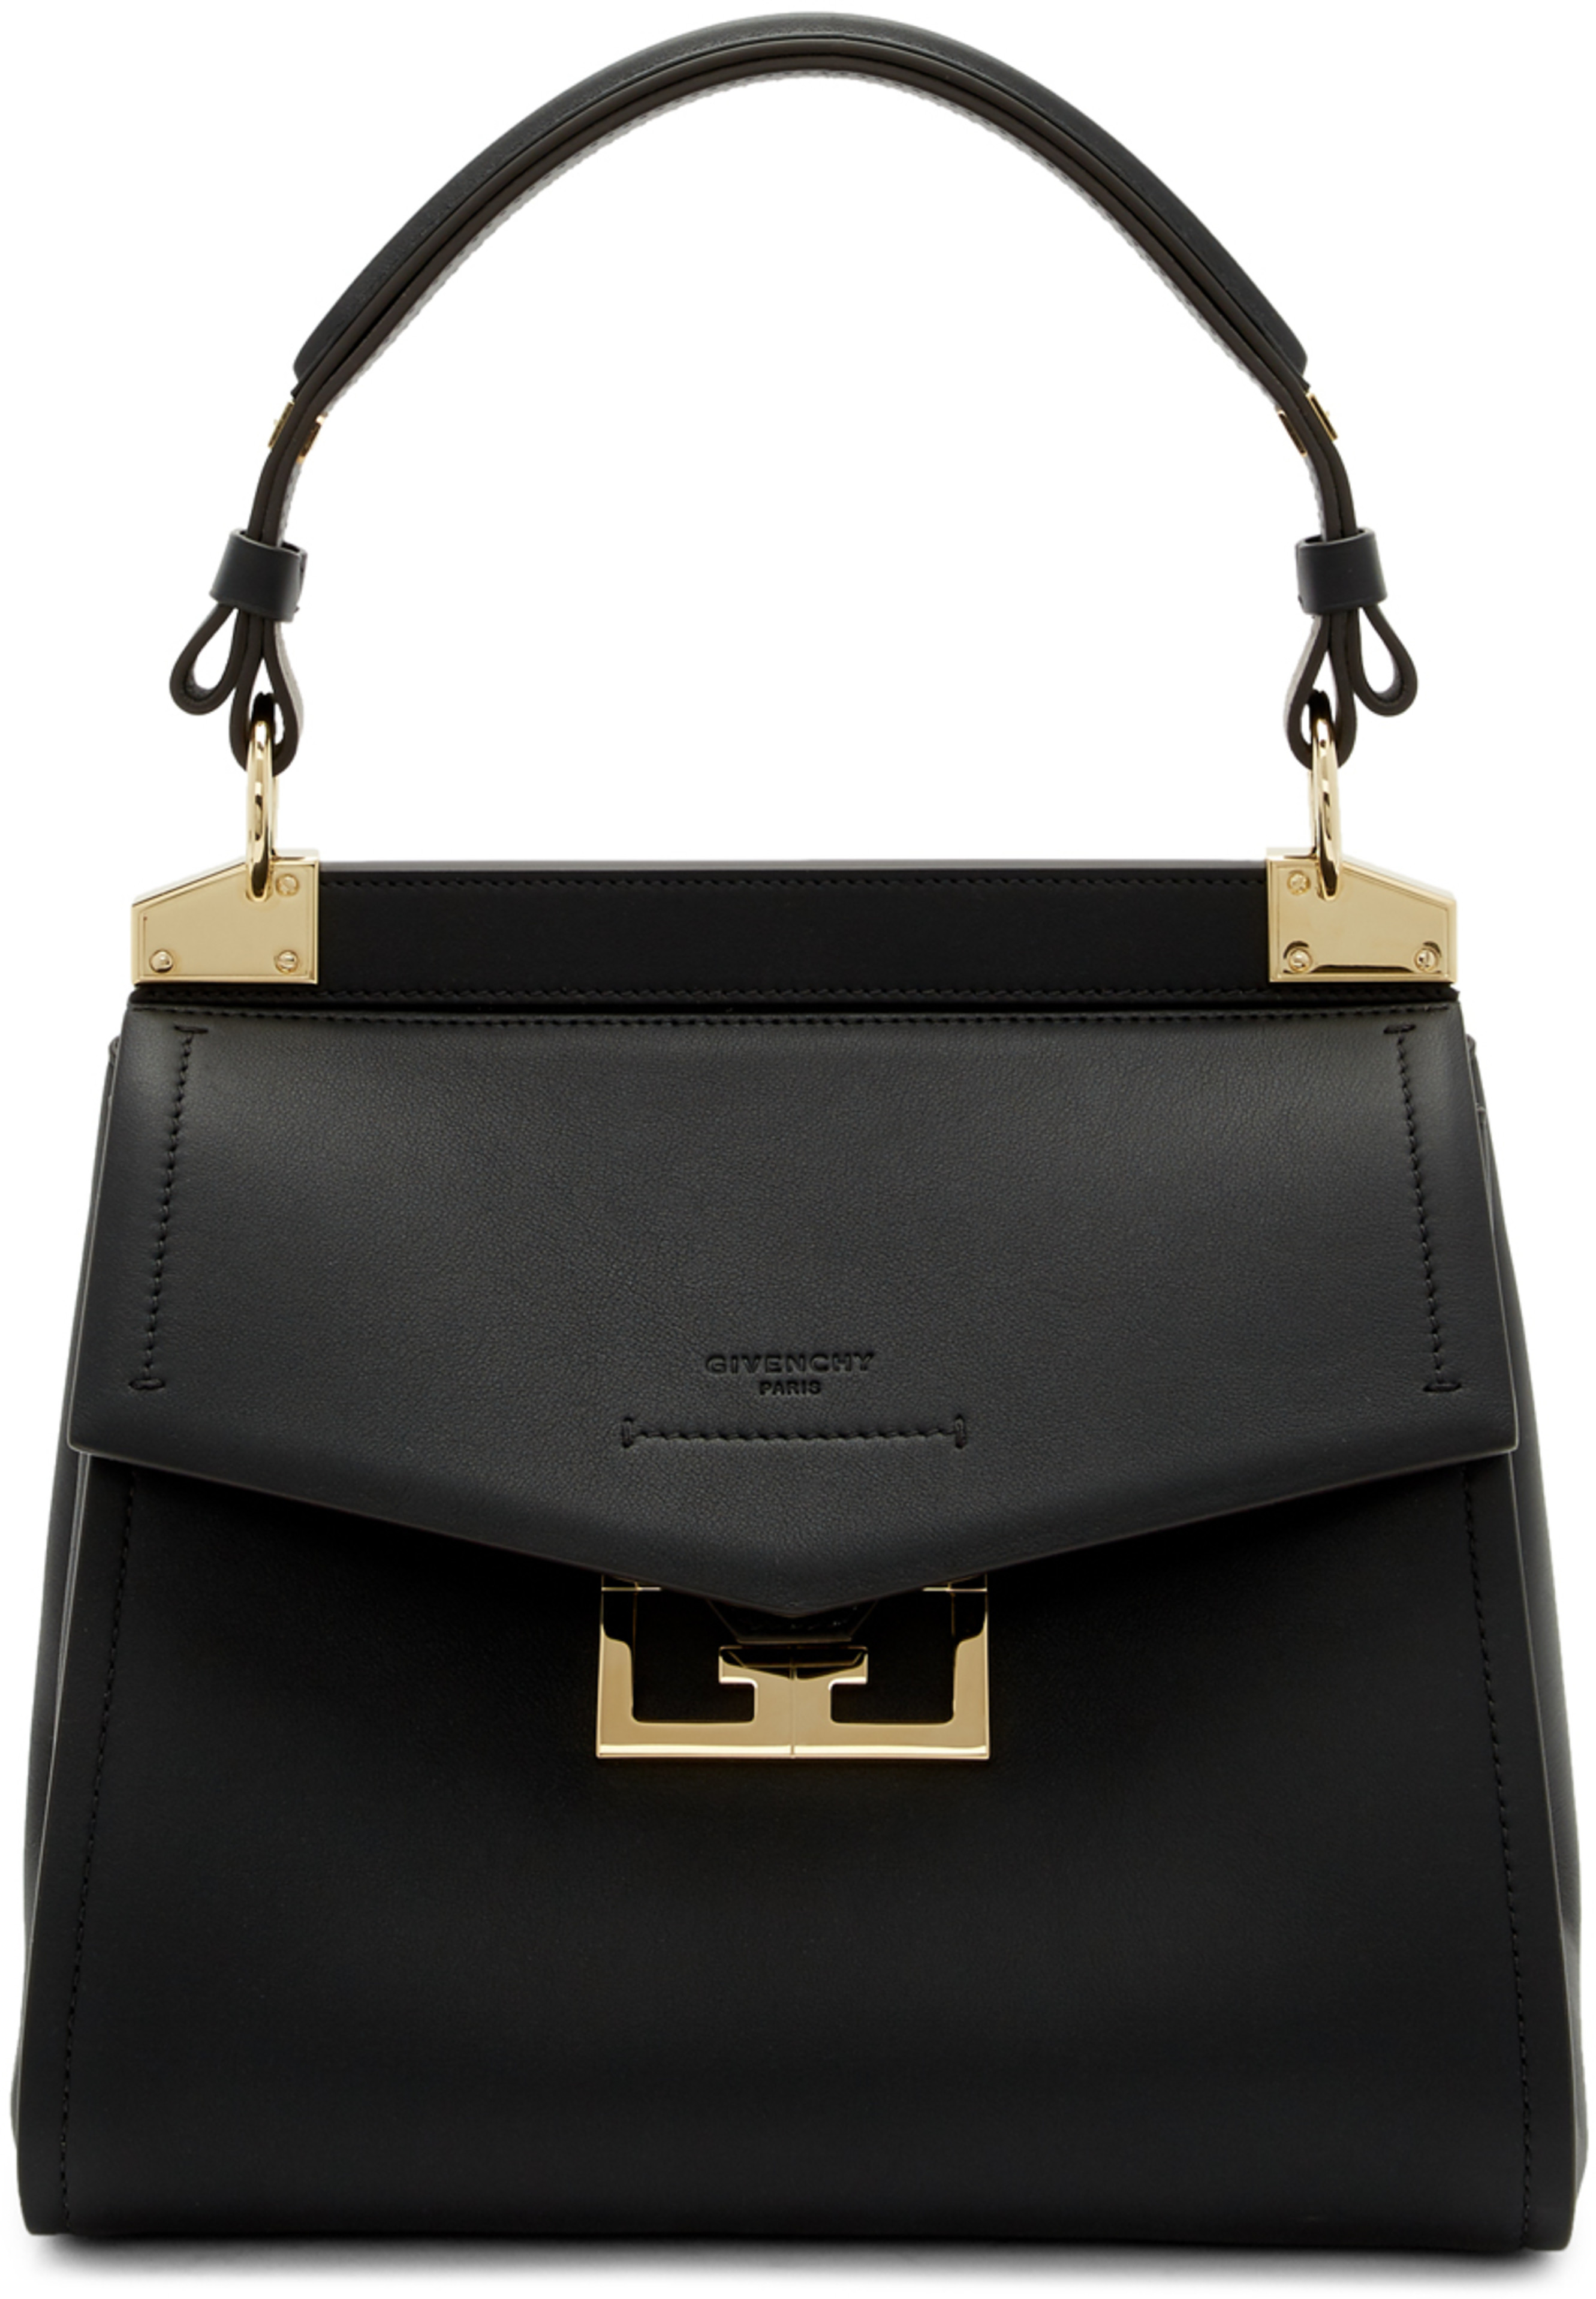 132459d28d8 Givenchy bags for Women | SSENSE